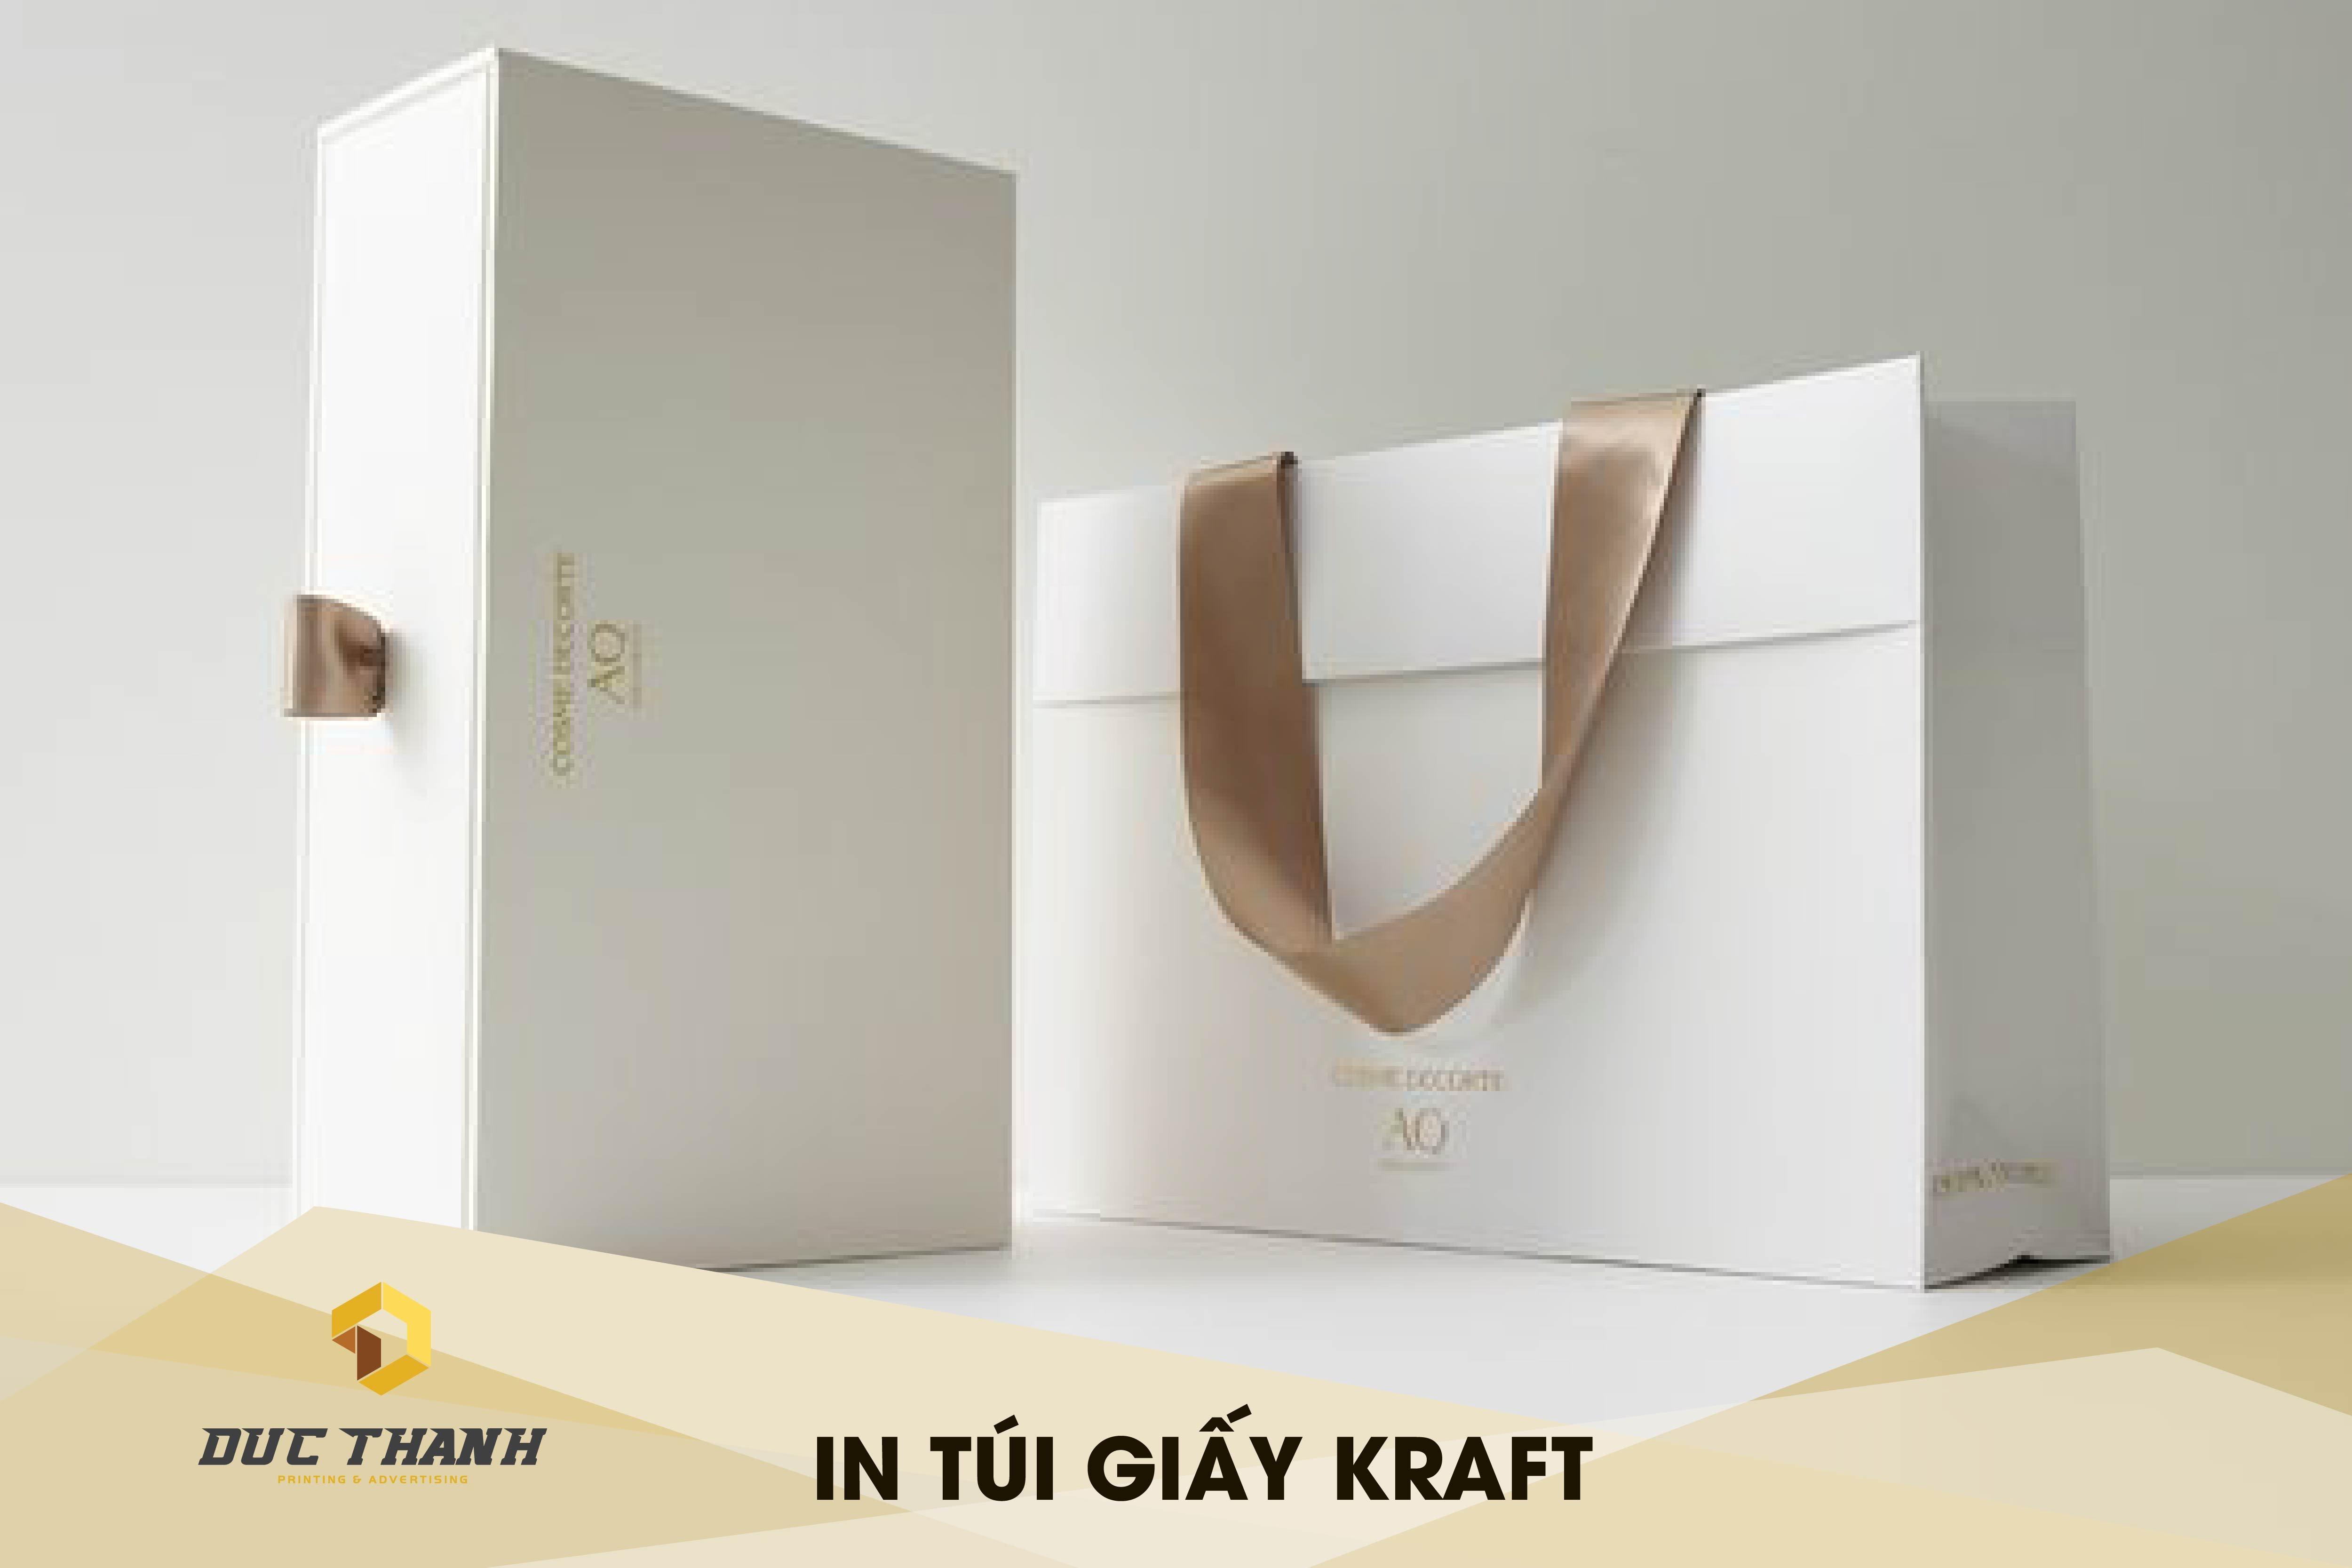 in-tui-giay-kraft-03